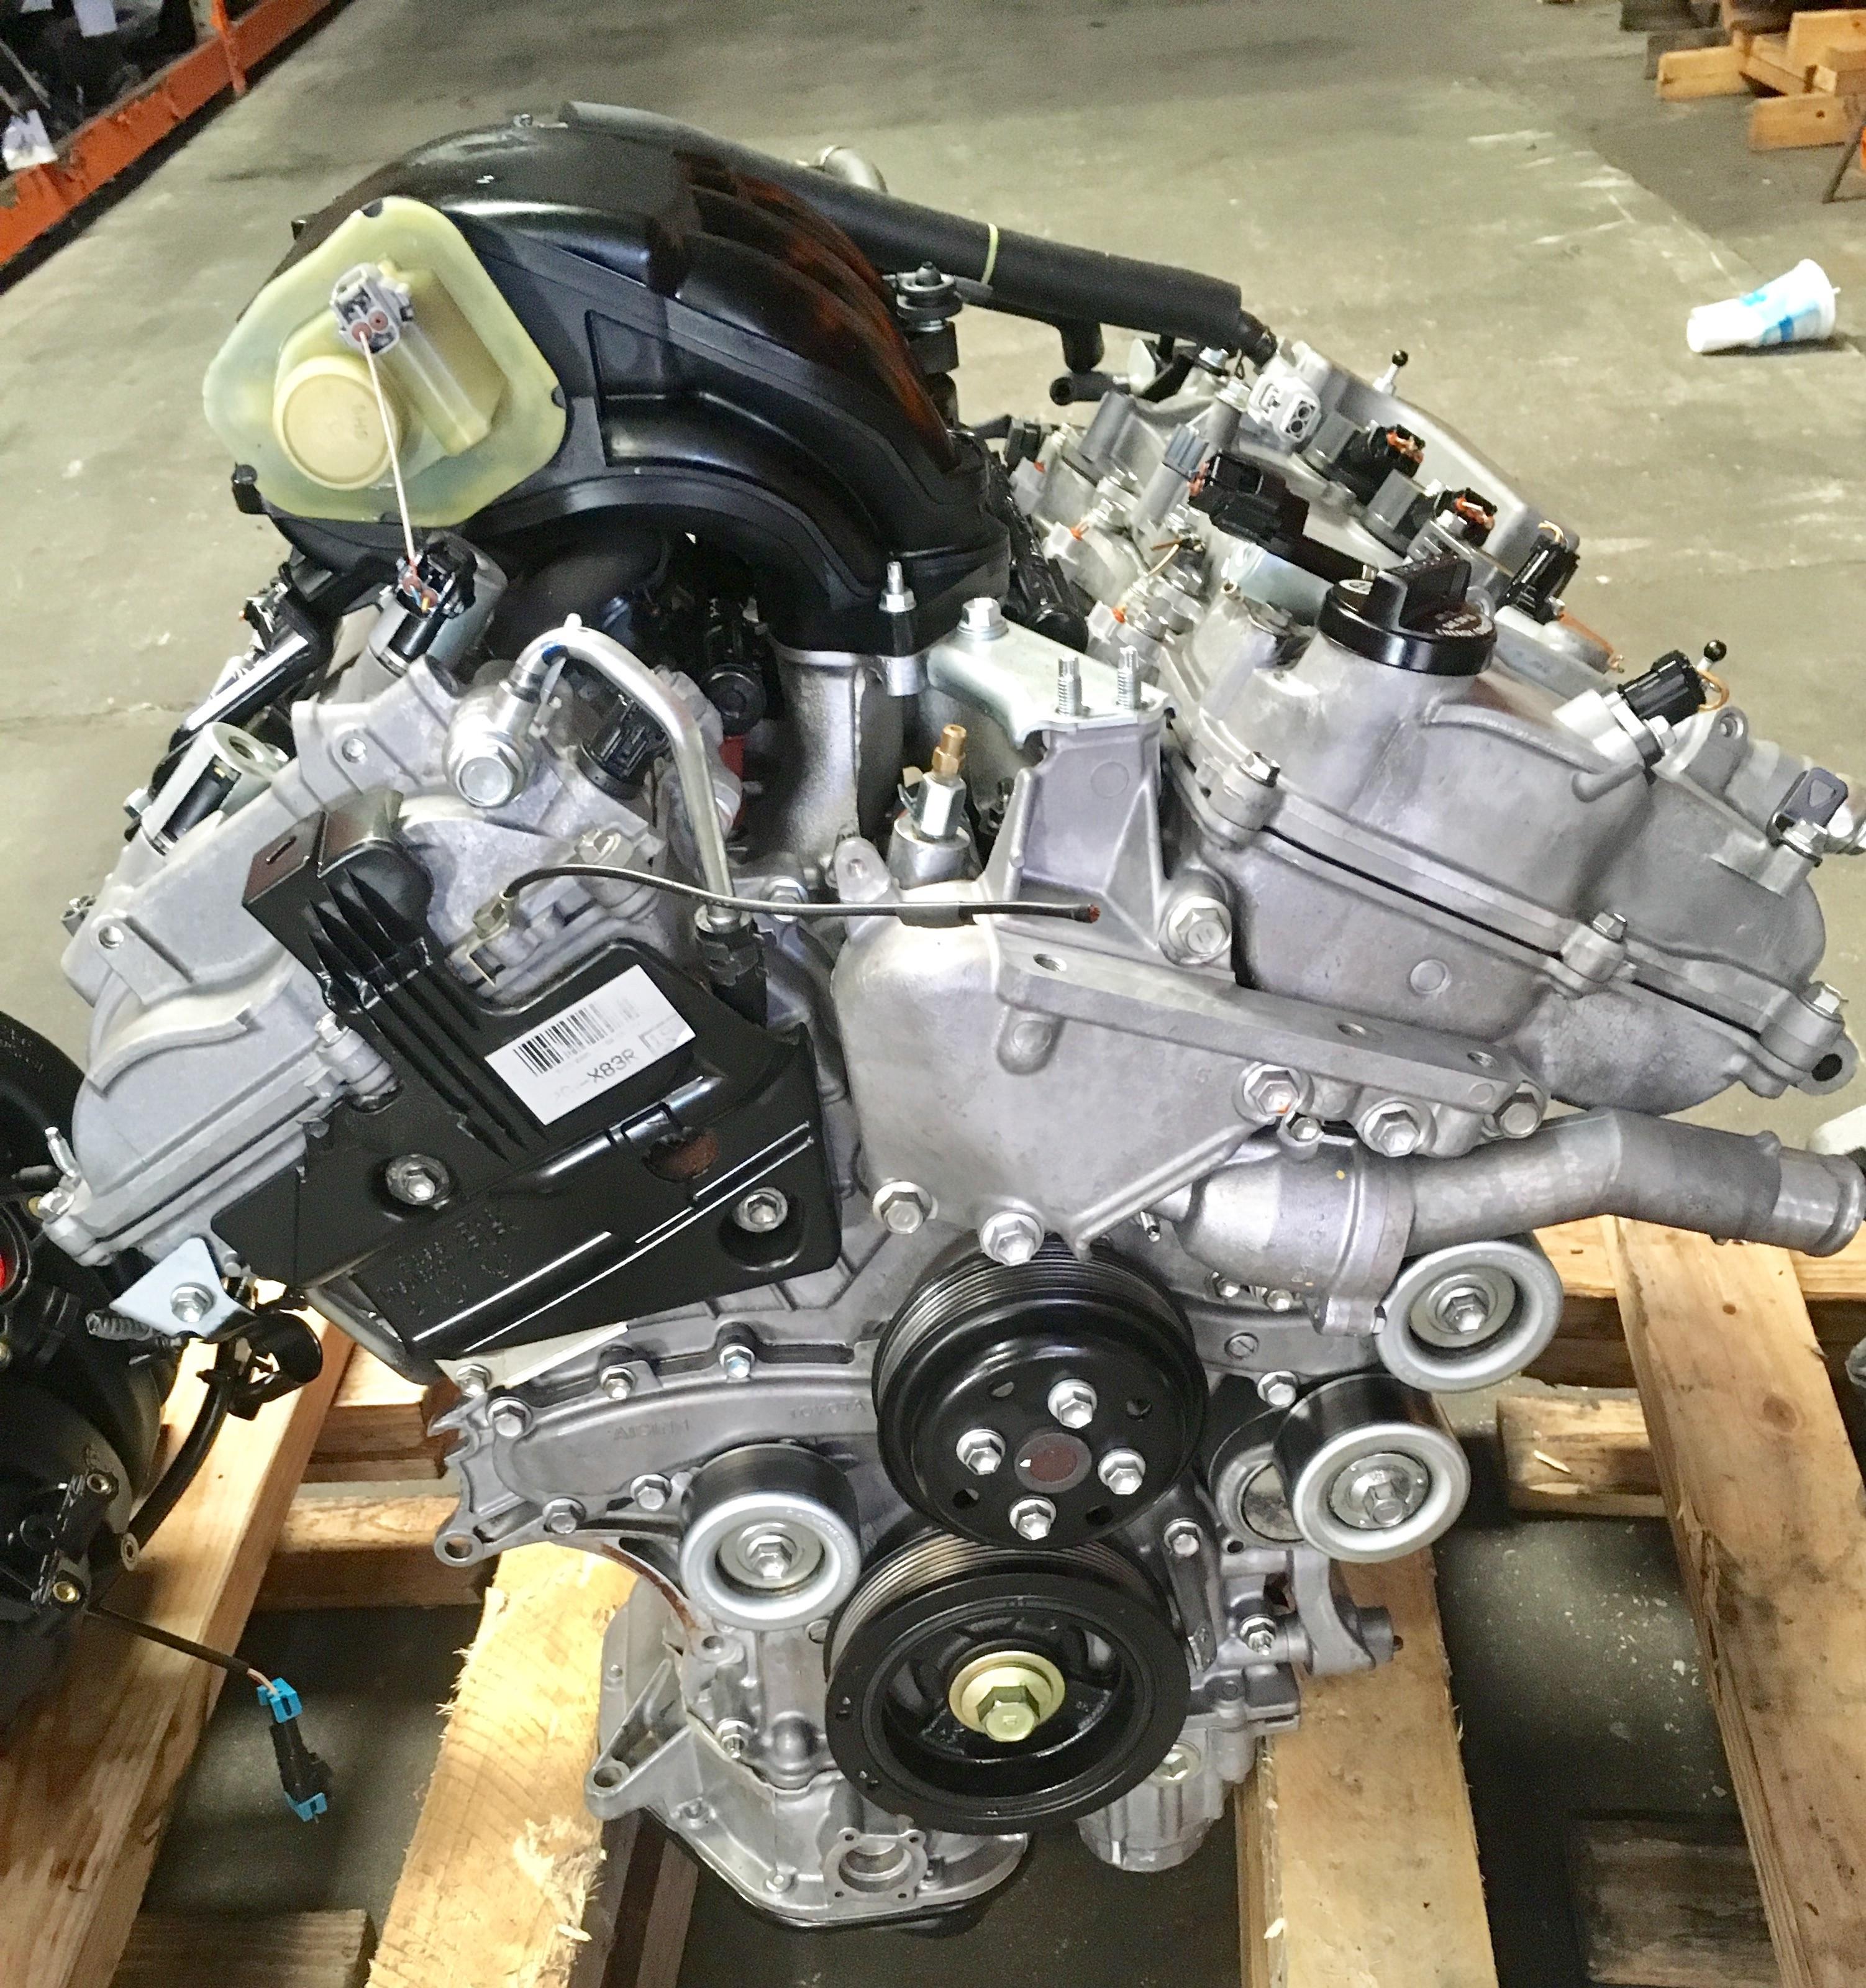 Rx 350 Engine Diagram Free Vehicle Wiring Diagrams Lexus Gs 2006 Toyota Avalon My Rh Detoxicrecenze Com Parts